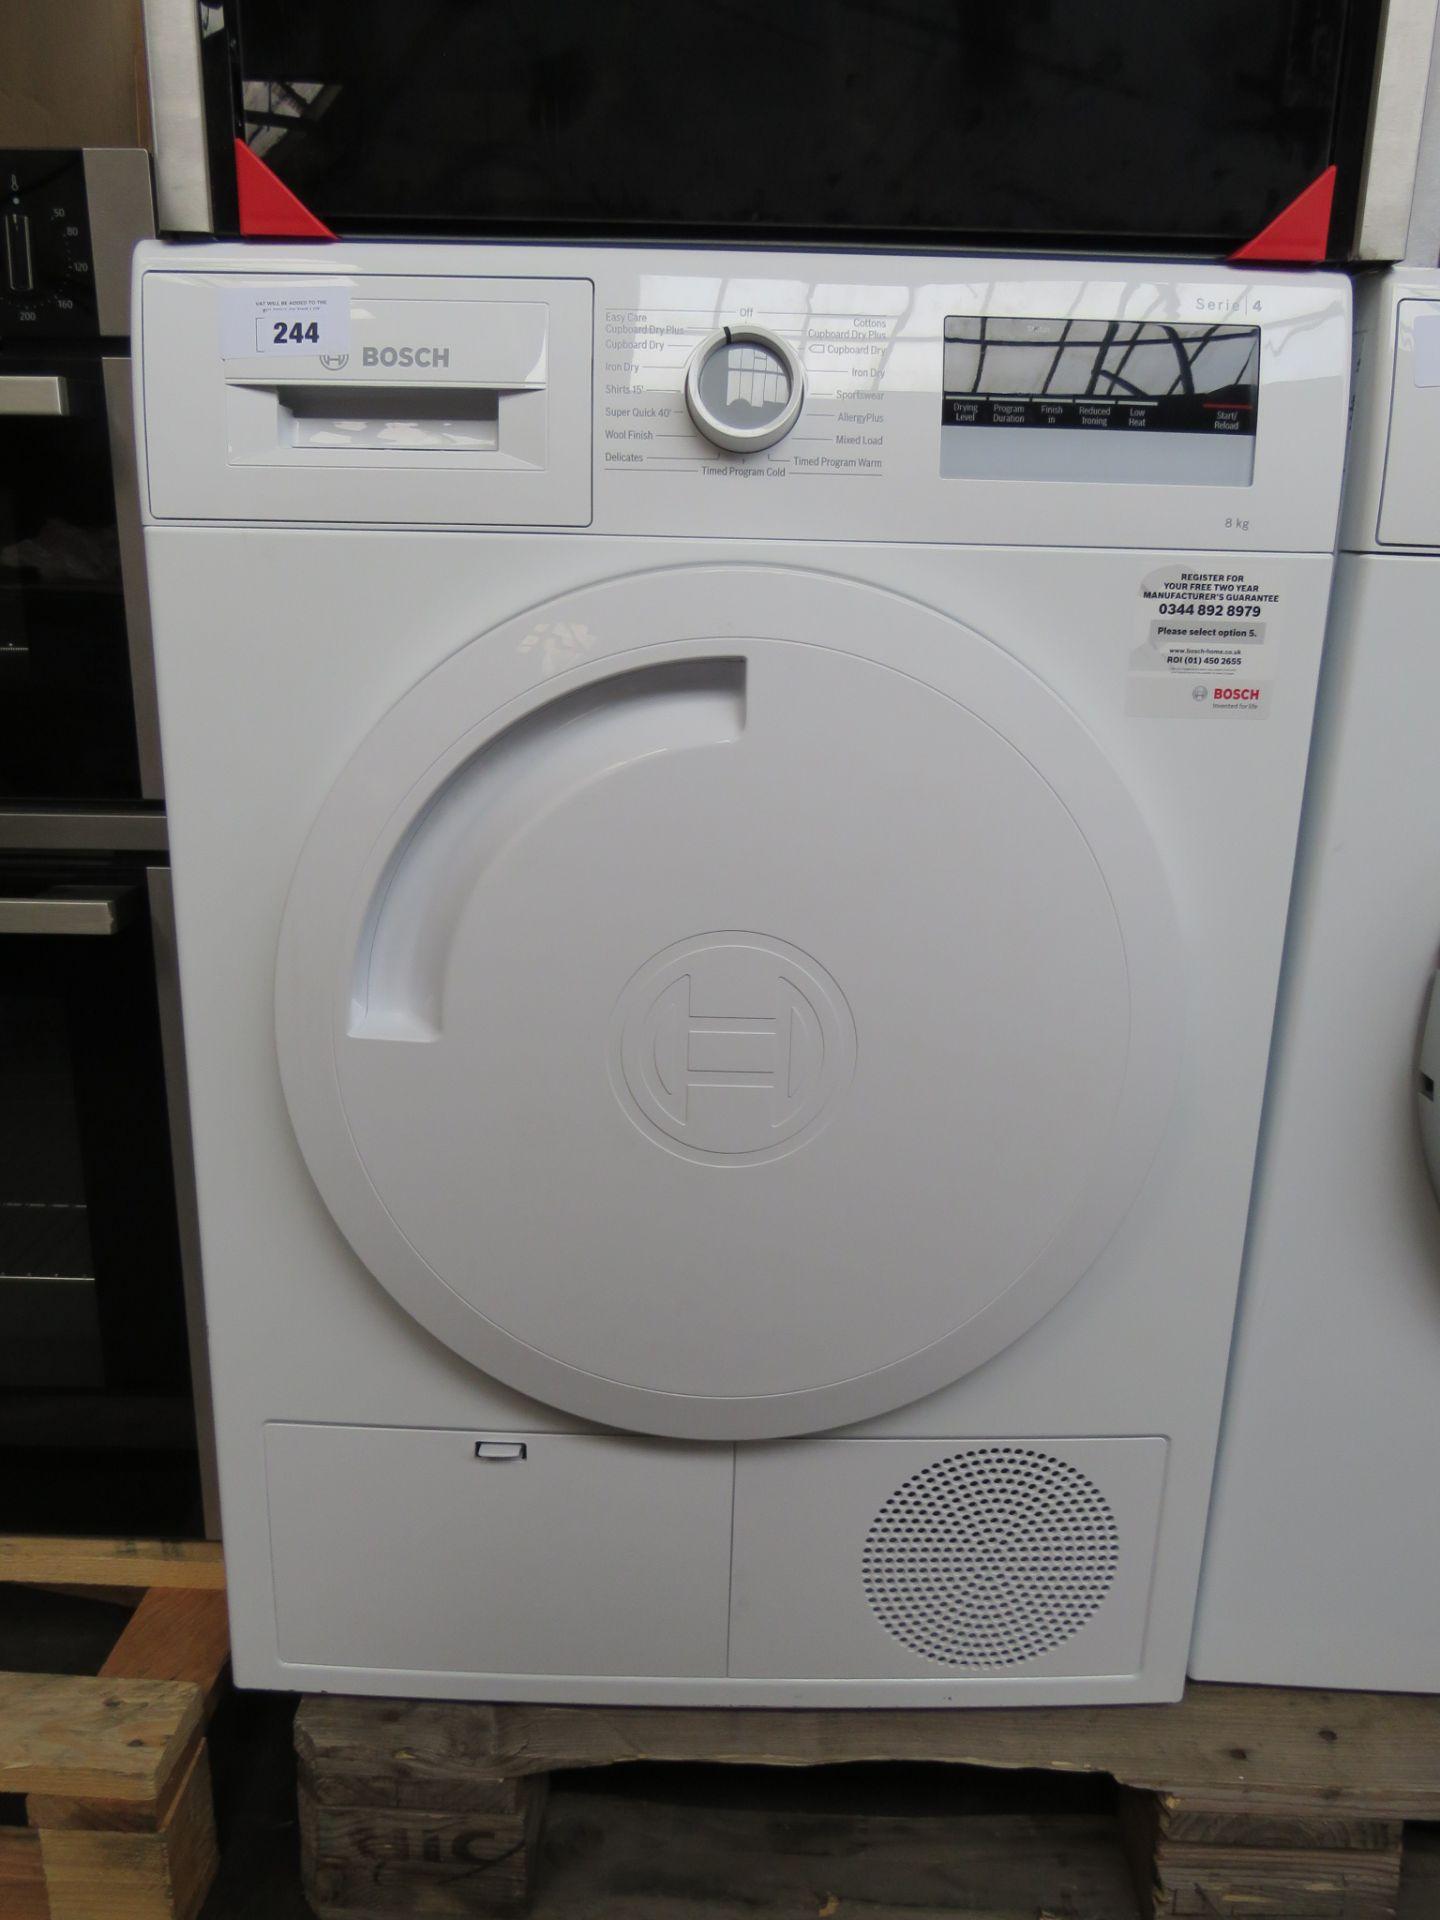 WTN83201GBB Bosch Tumble dryer